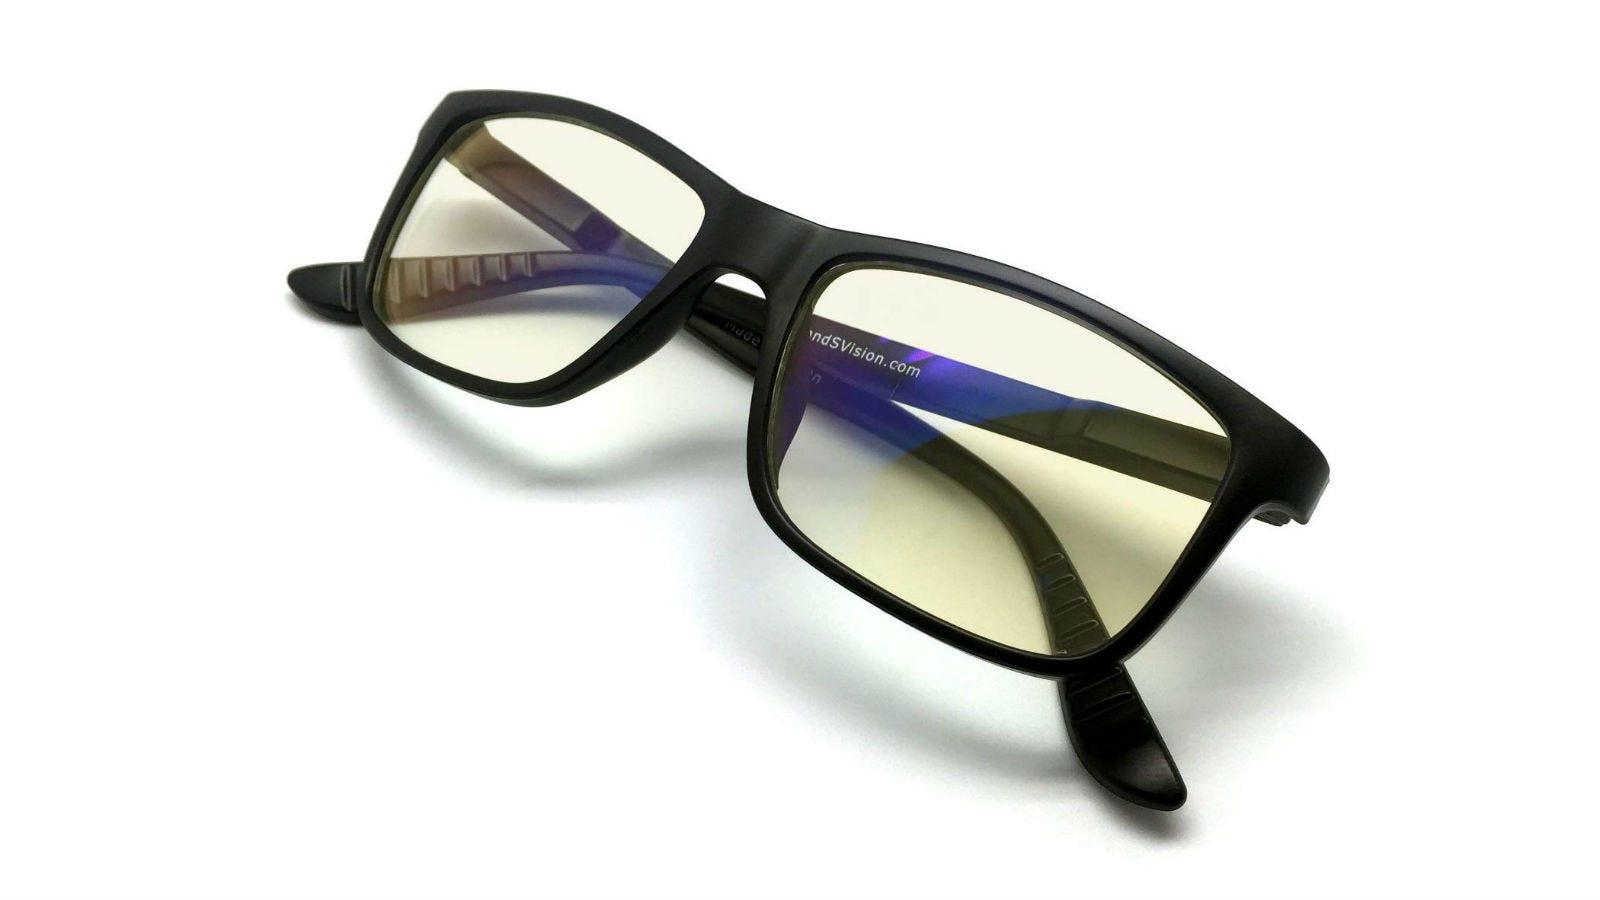 J&S Vision Blue Light Shield Computer/Gaming Glasses